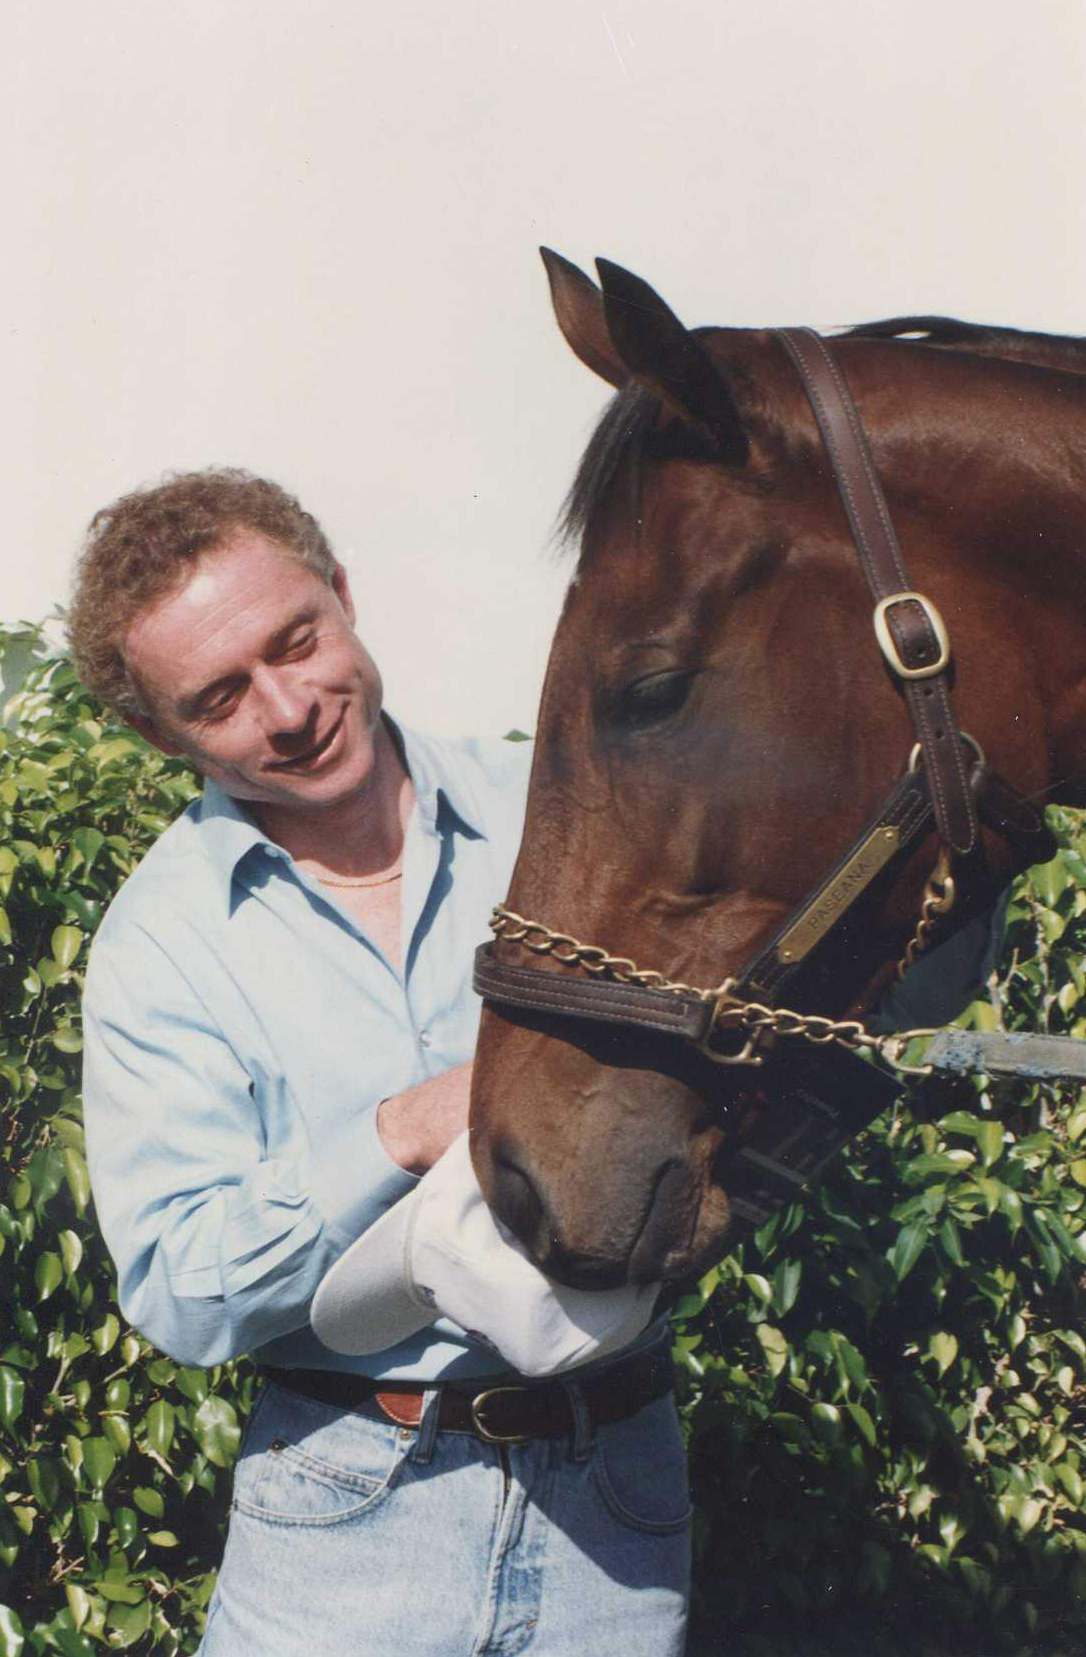 Paseana with jockey Chris McCarron at Gulfstream Park, October 1992 (Barbara D. Livingston/Museum Collection)